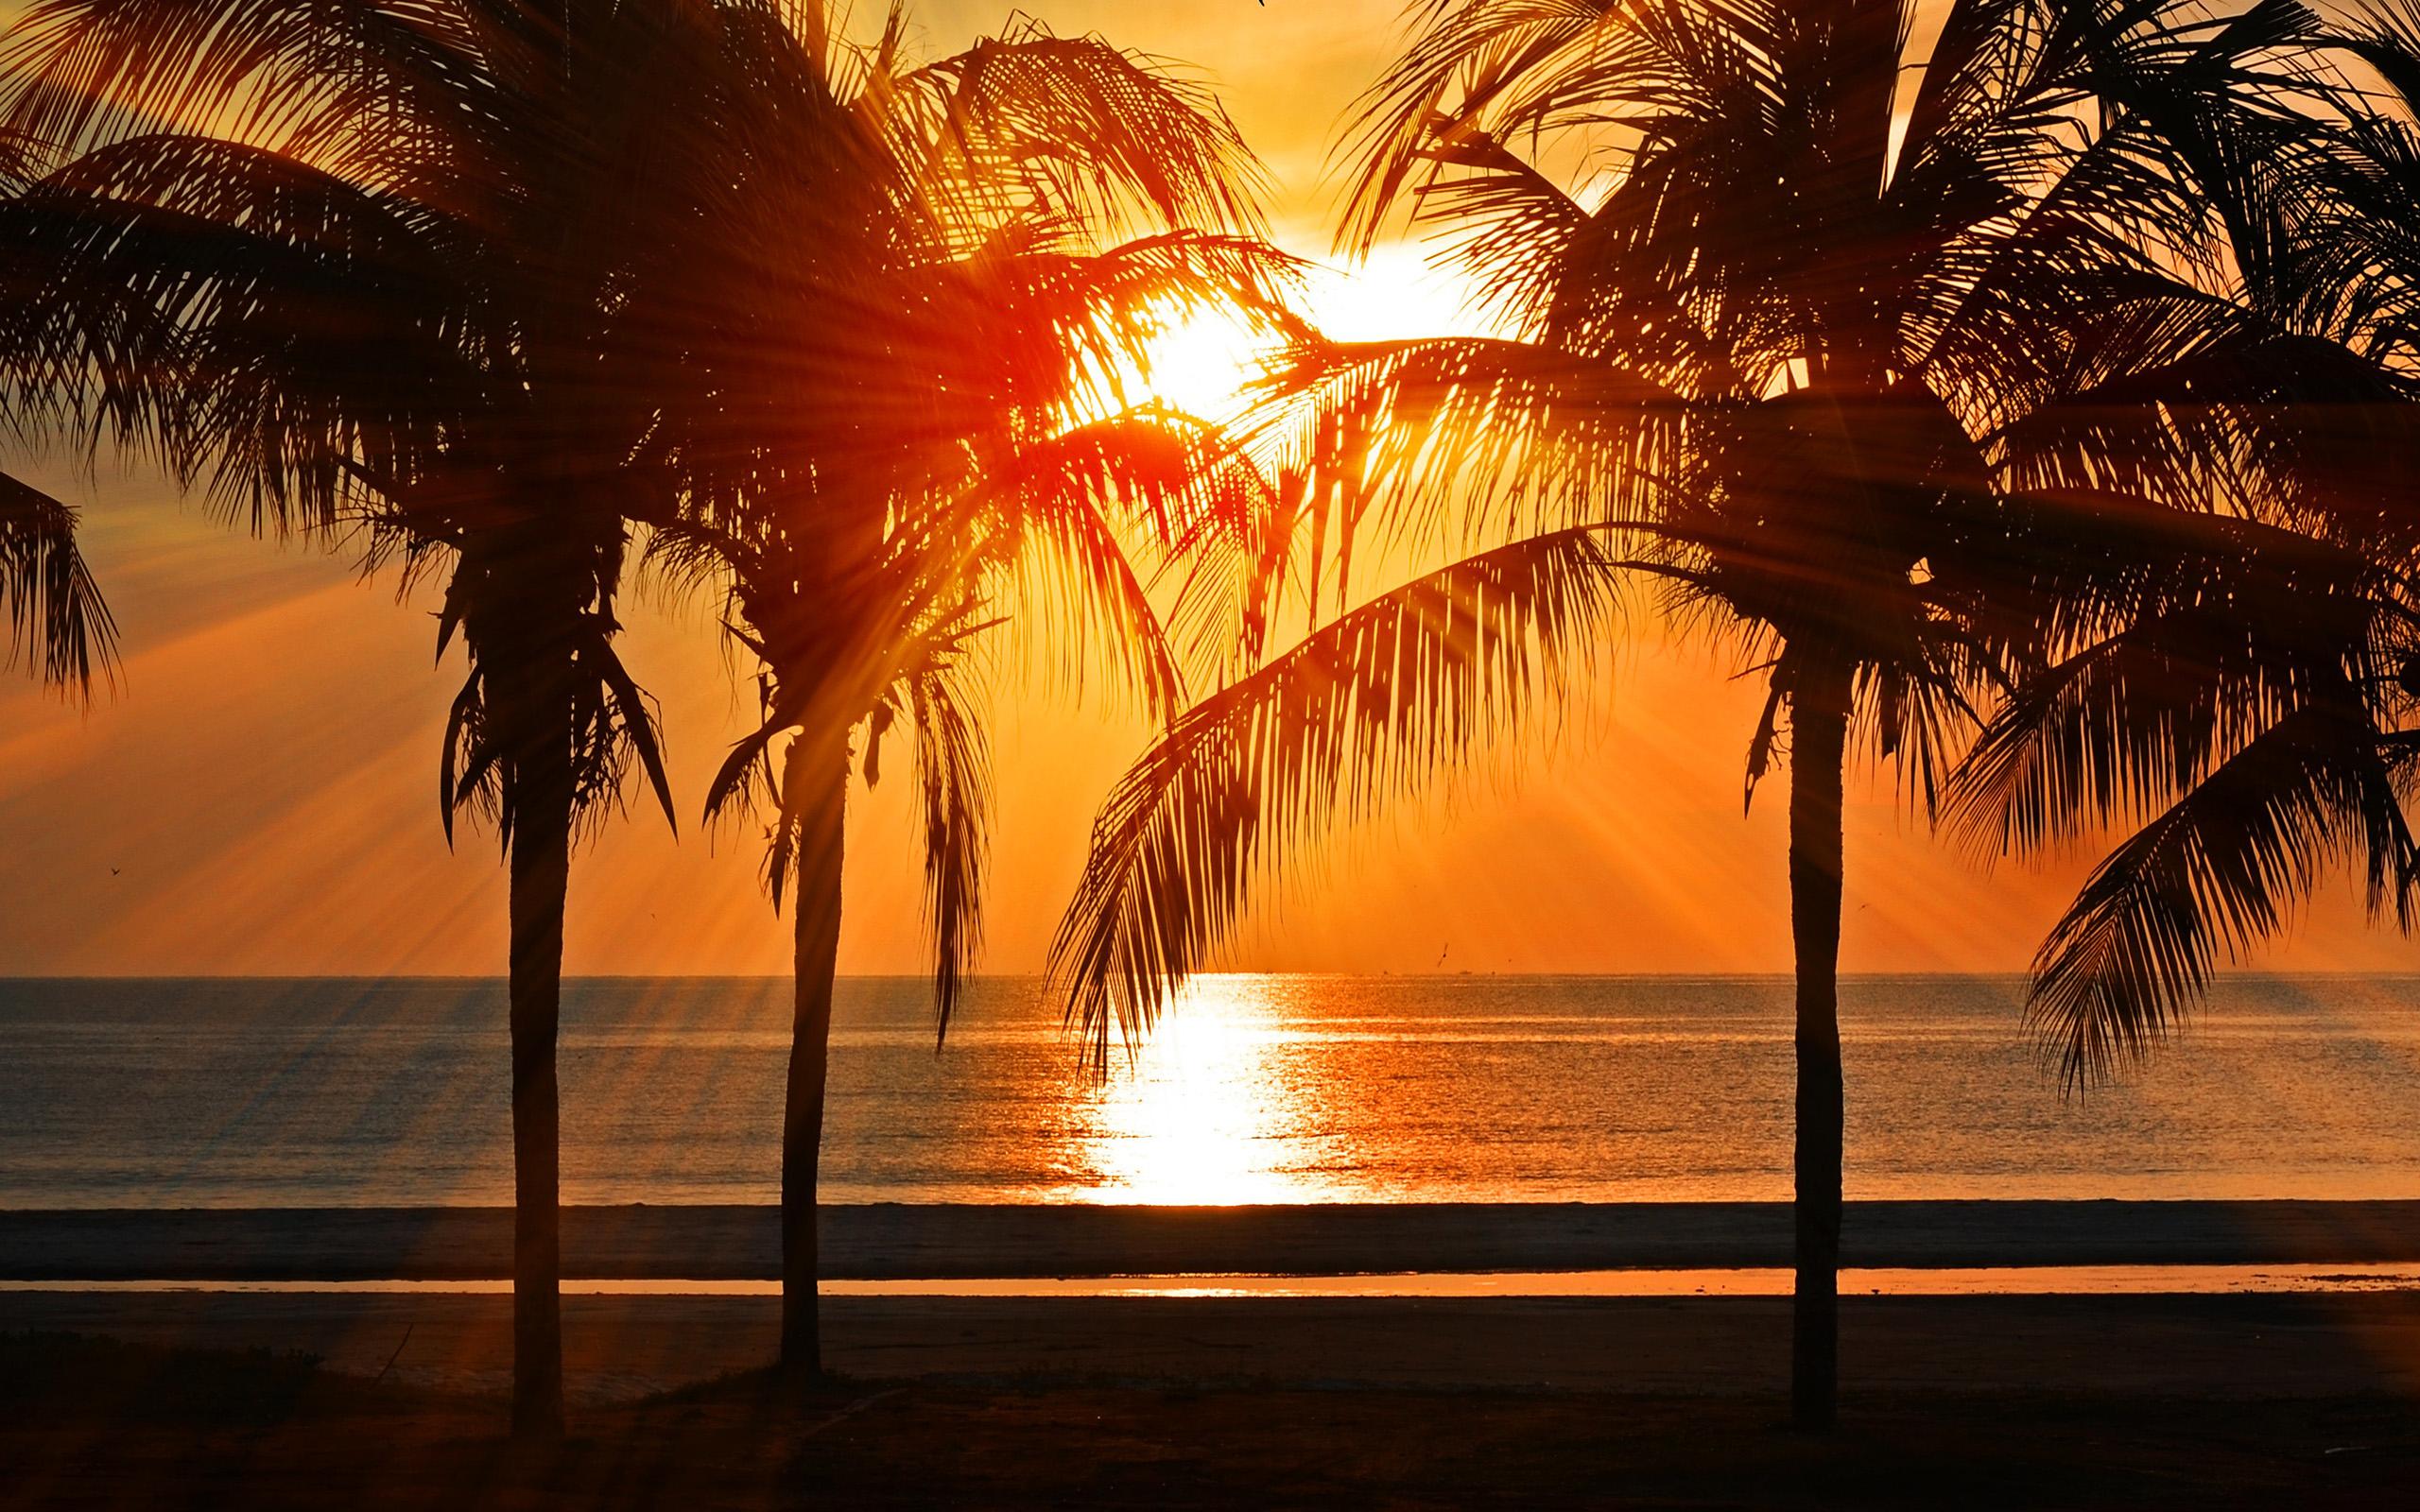 Best 3d Droid Wallpaper Nl74 Beach Vacation Summer Night Sunset Red Palm Tree